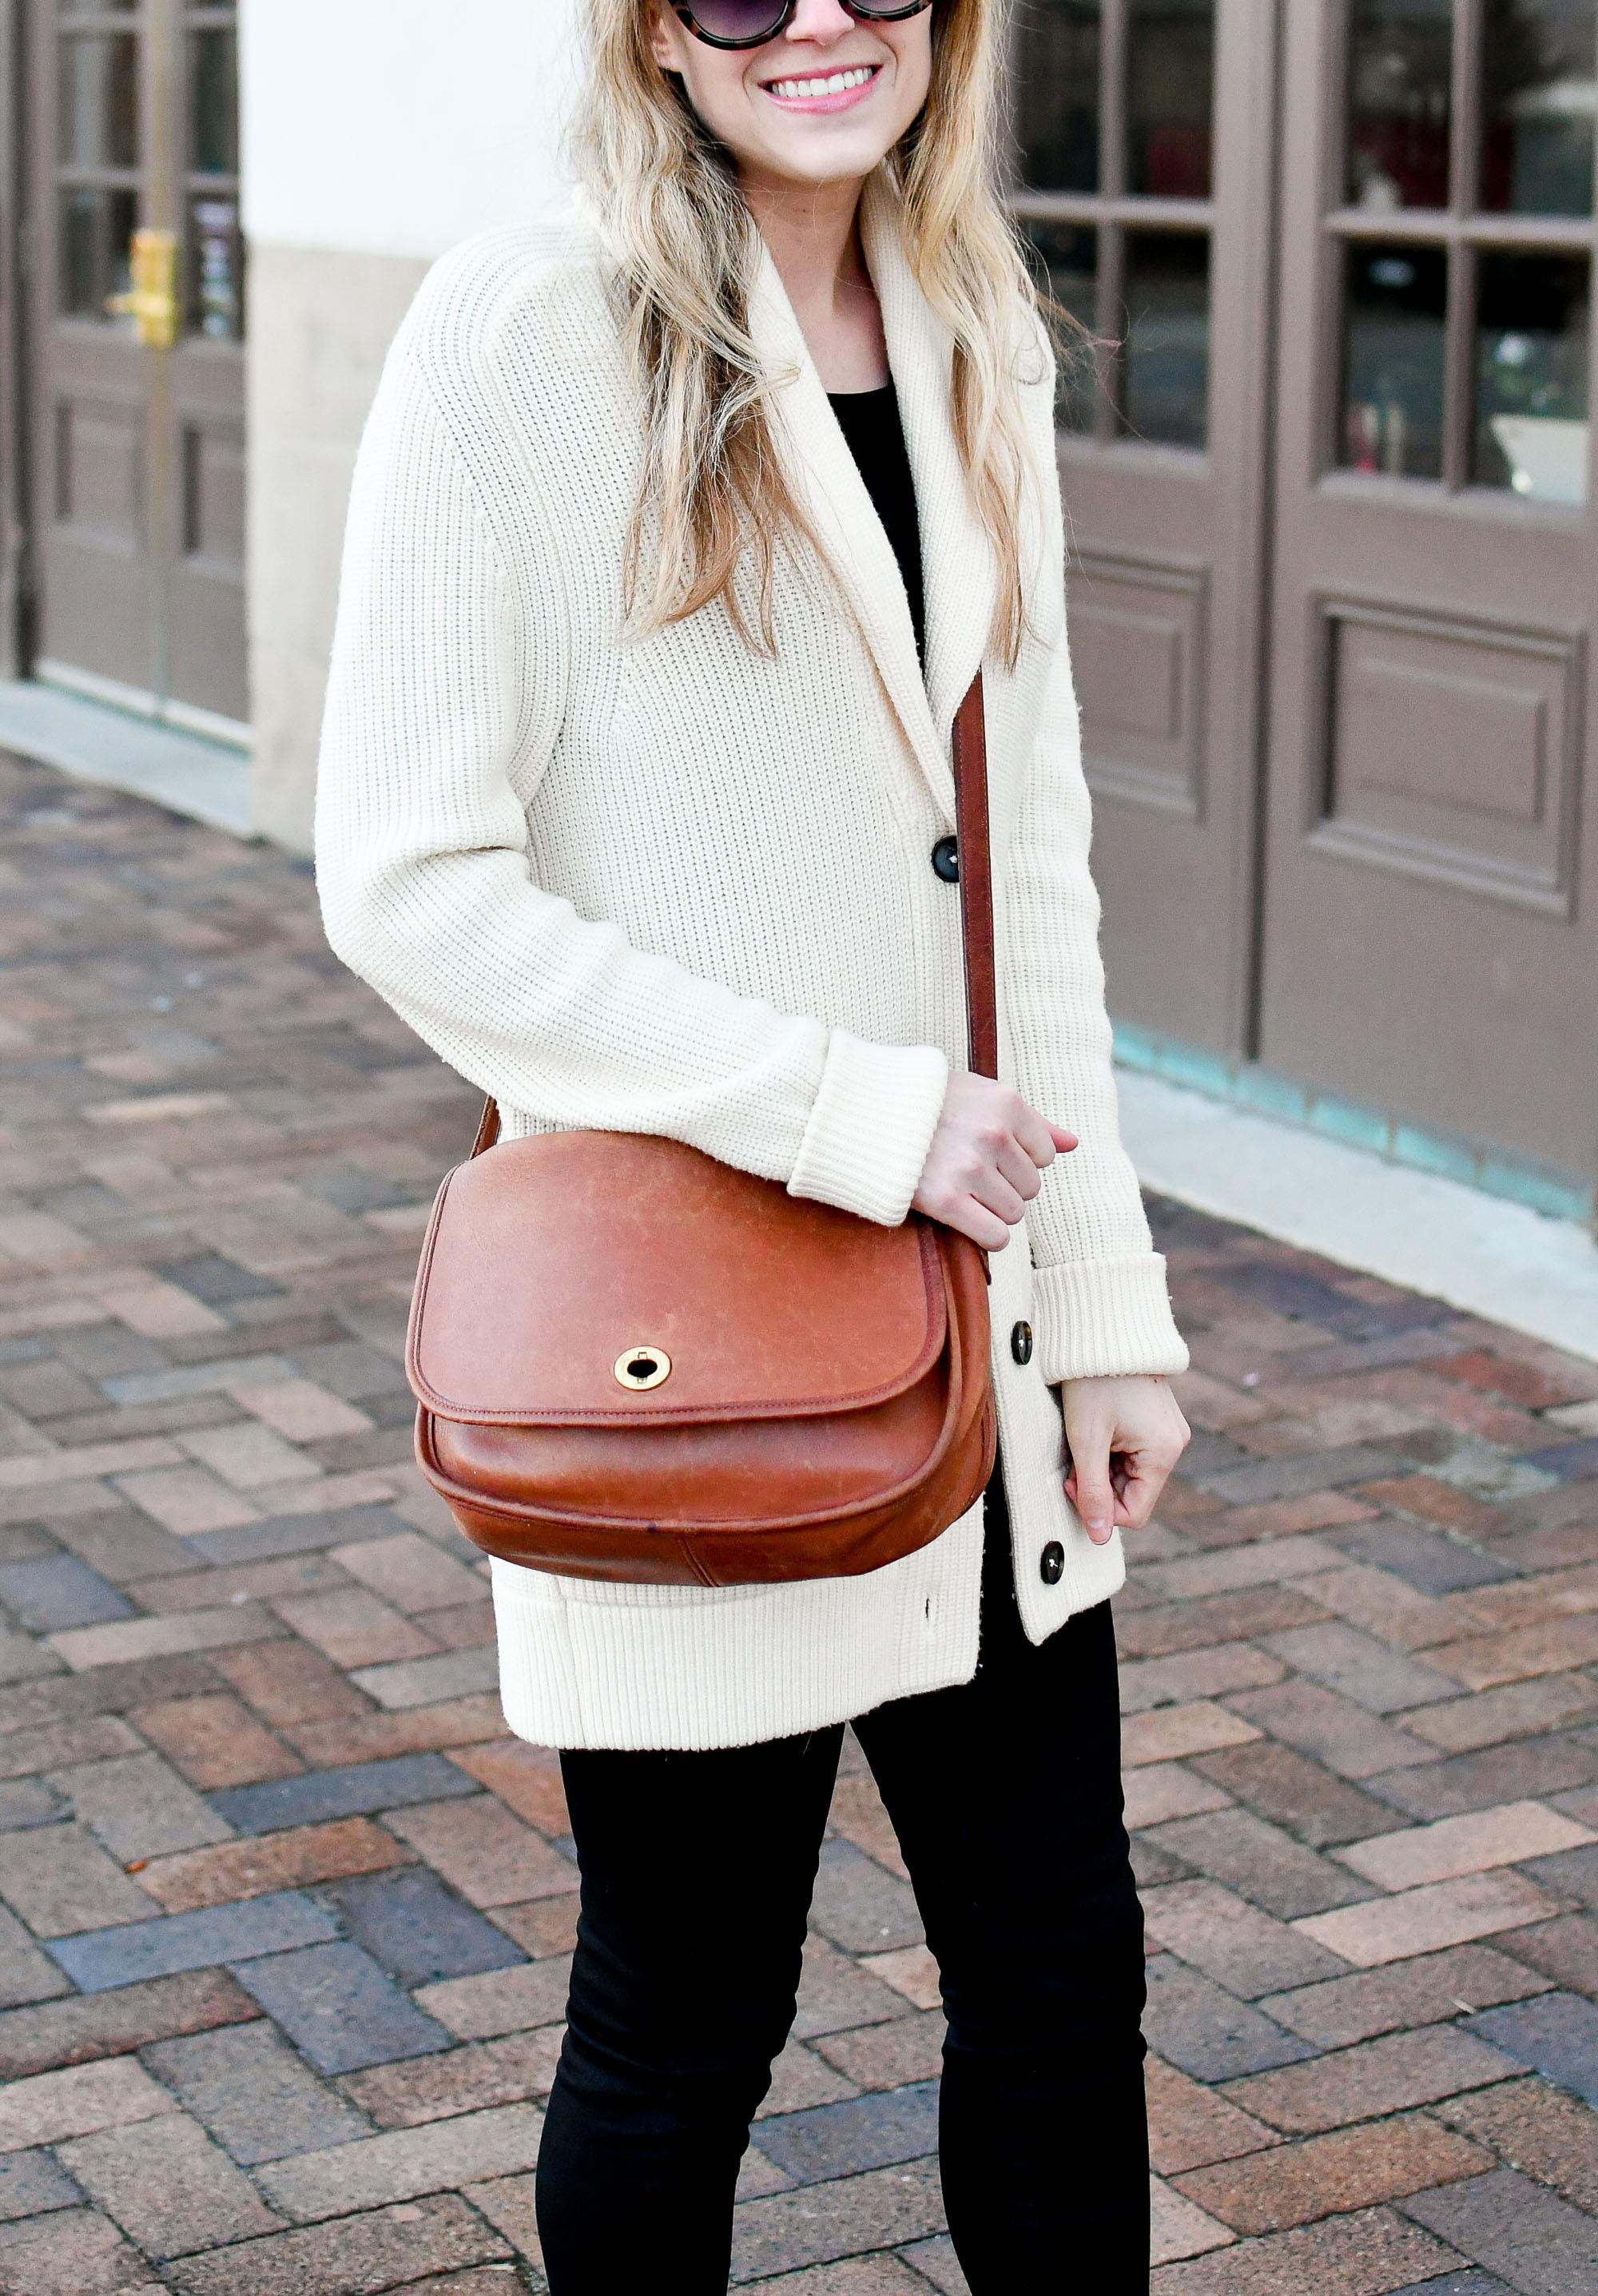 Vintage Coach City bag casual winter outfit — Cotton Cashmere Cat Hair